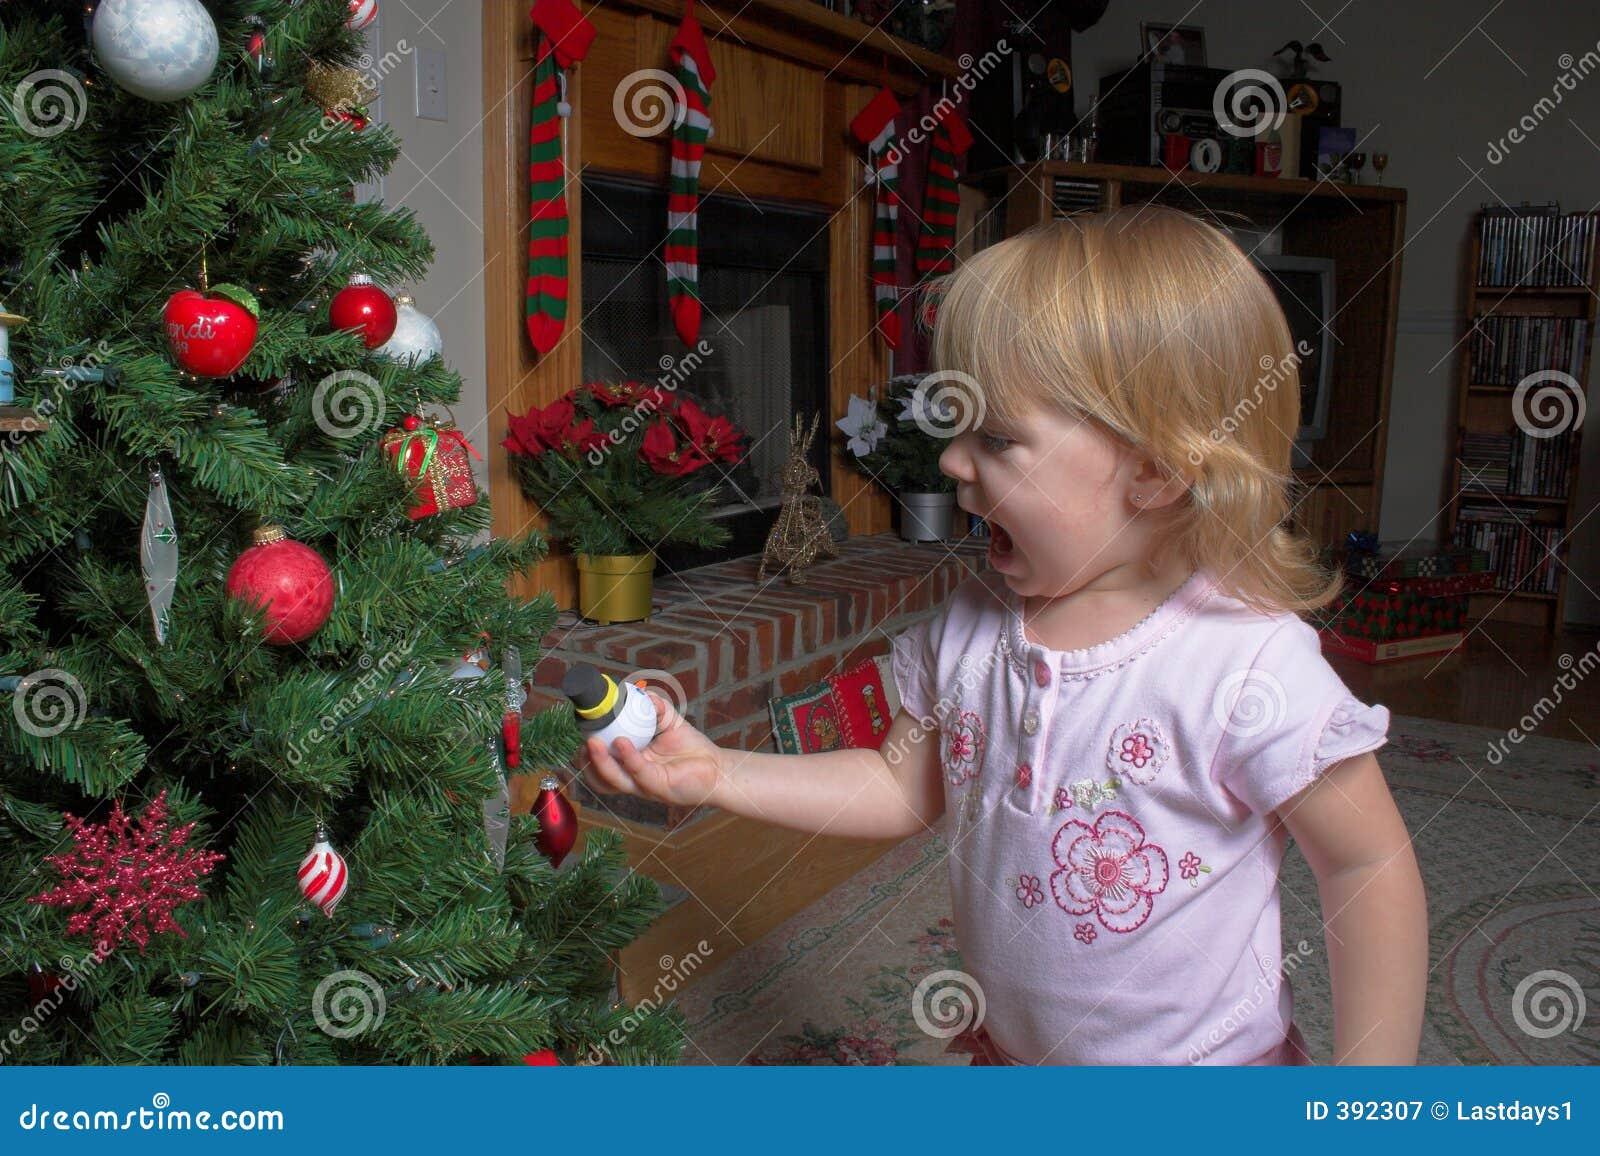 Toddler and Christmas tree